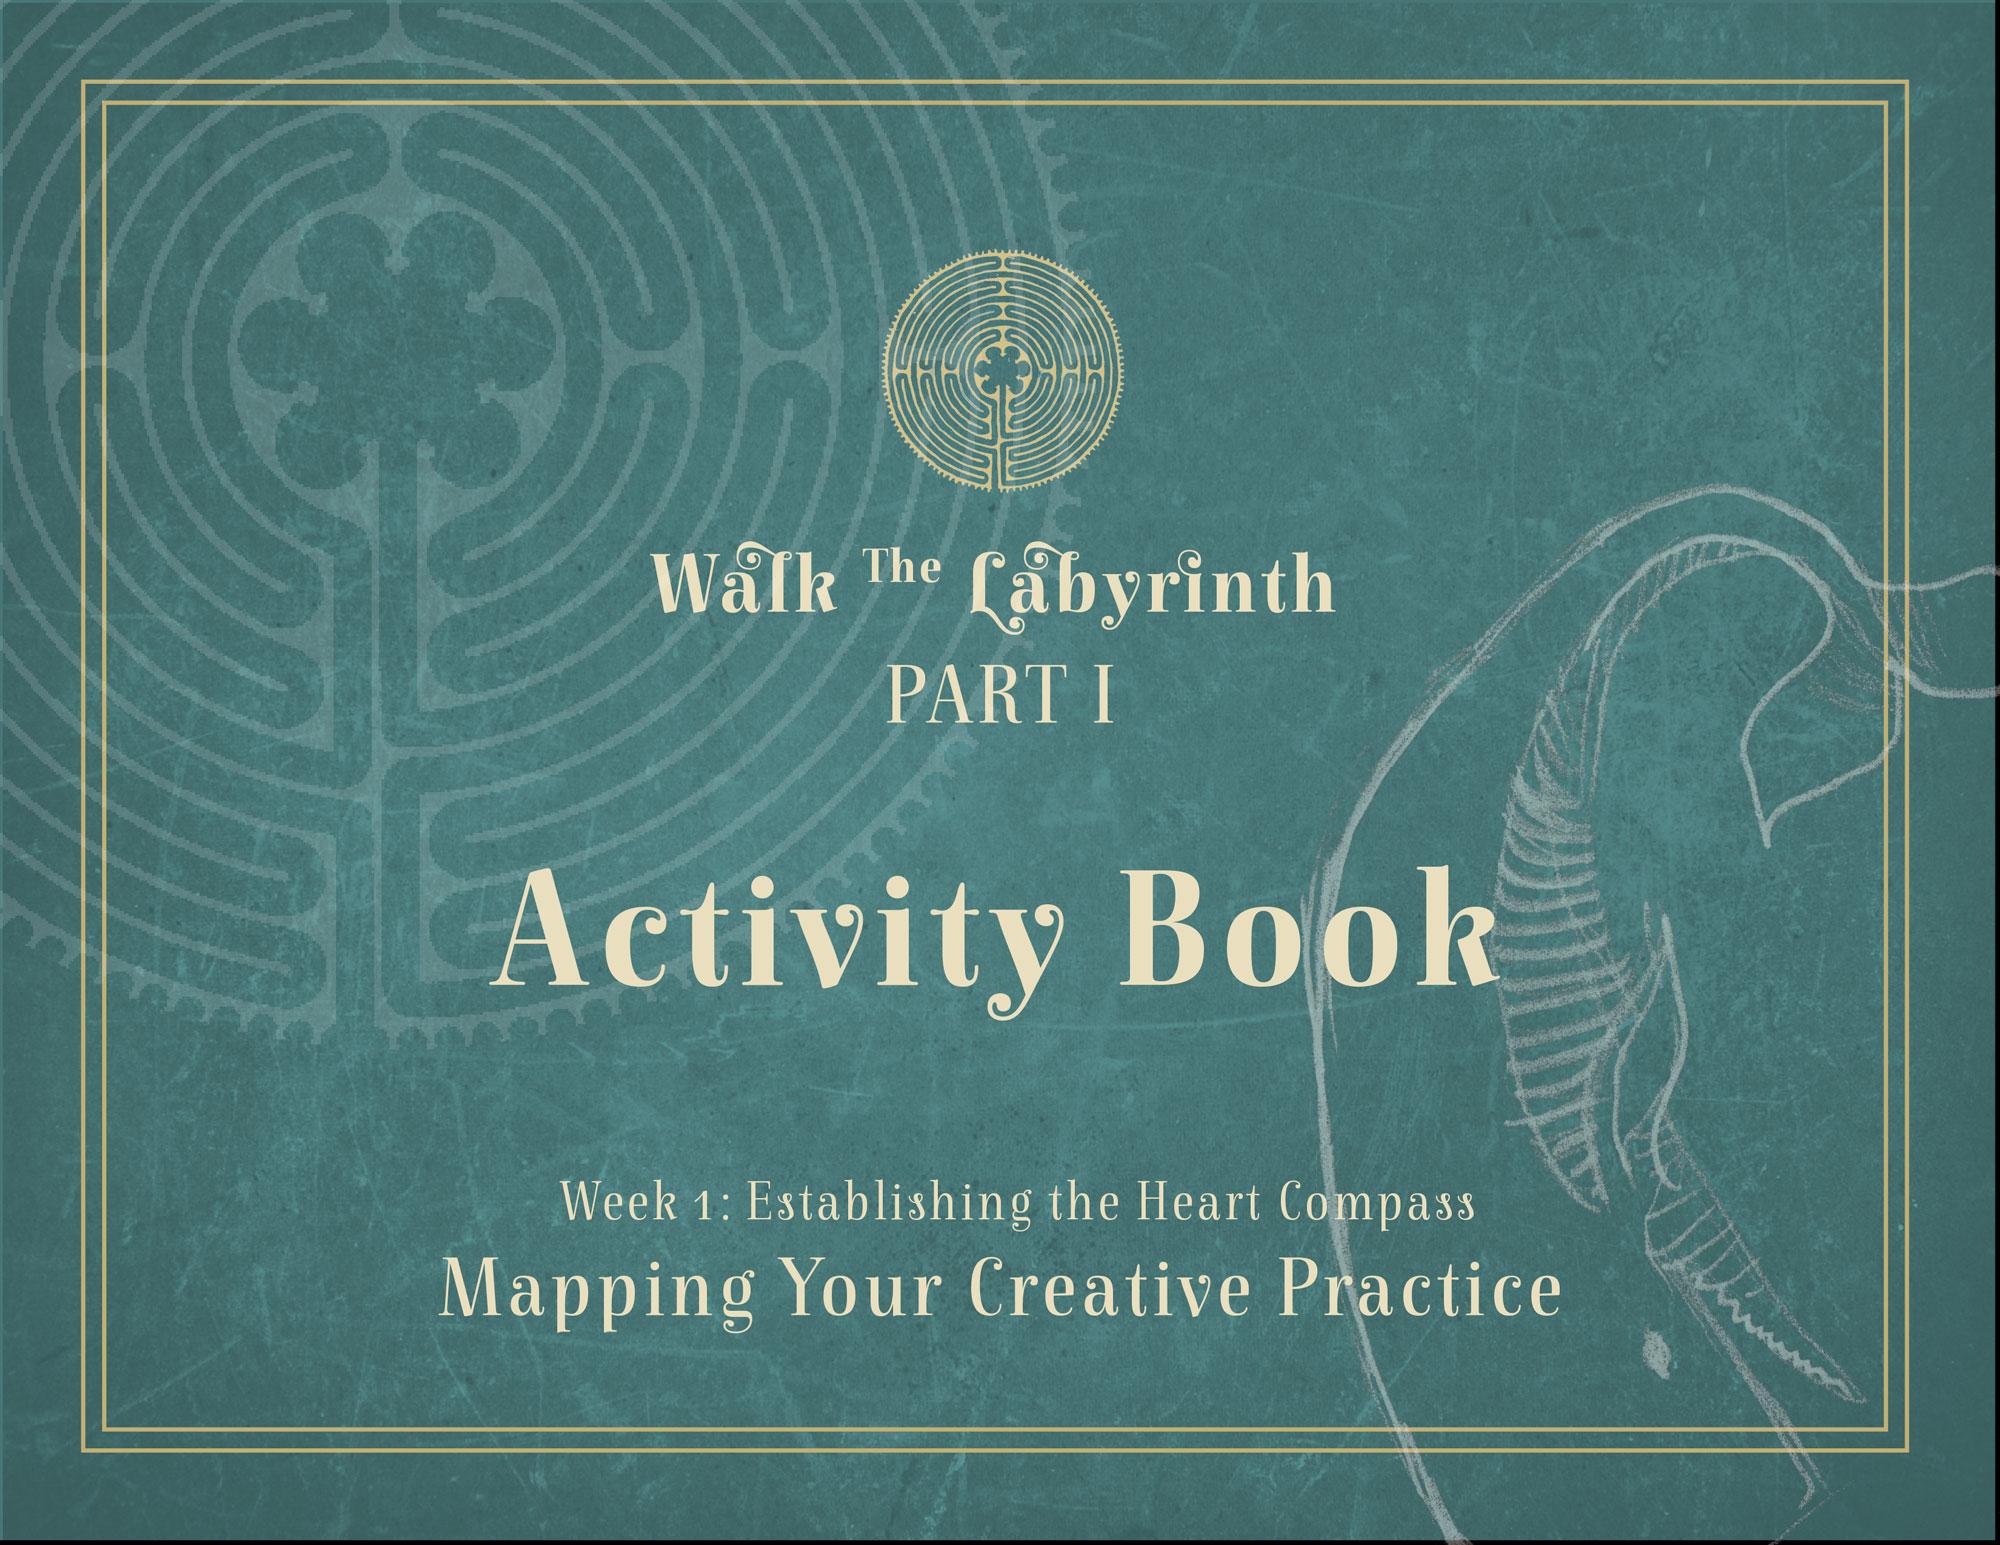 wtl-activitybook-p1w1d2-1